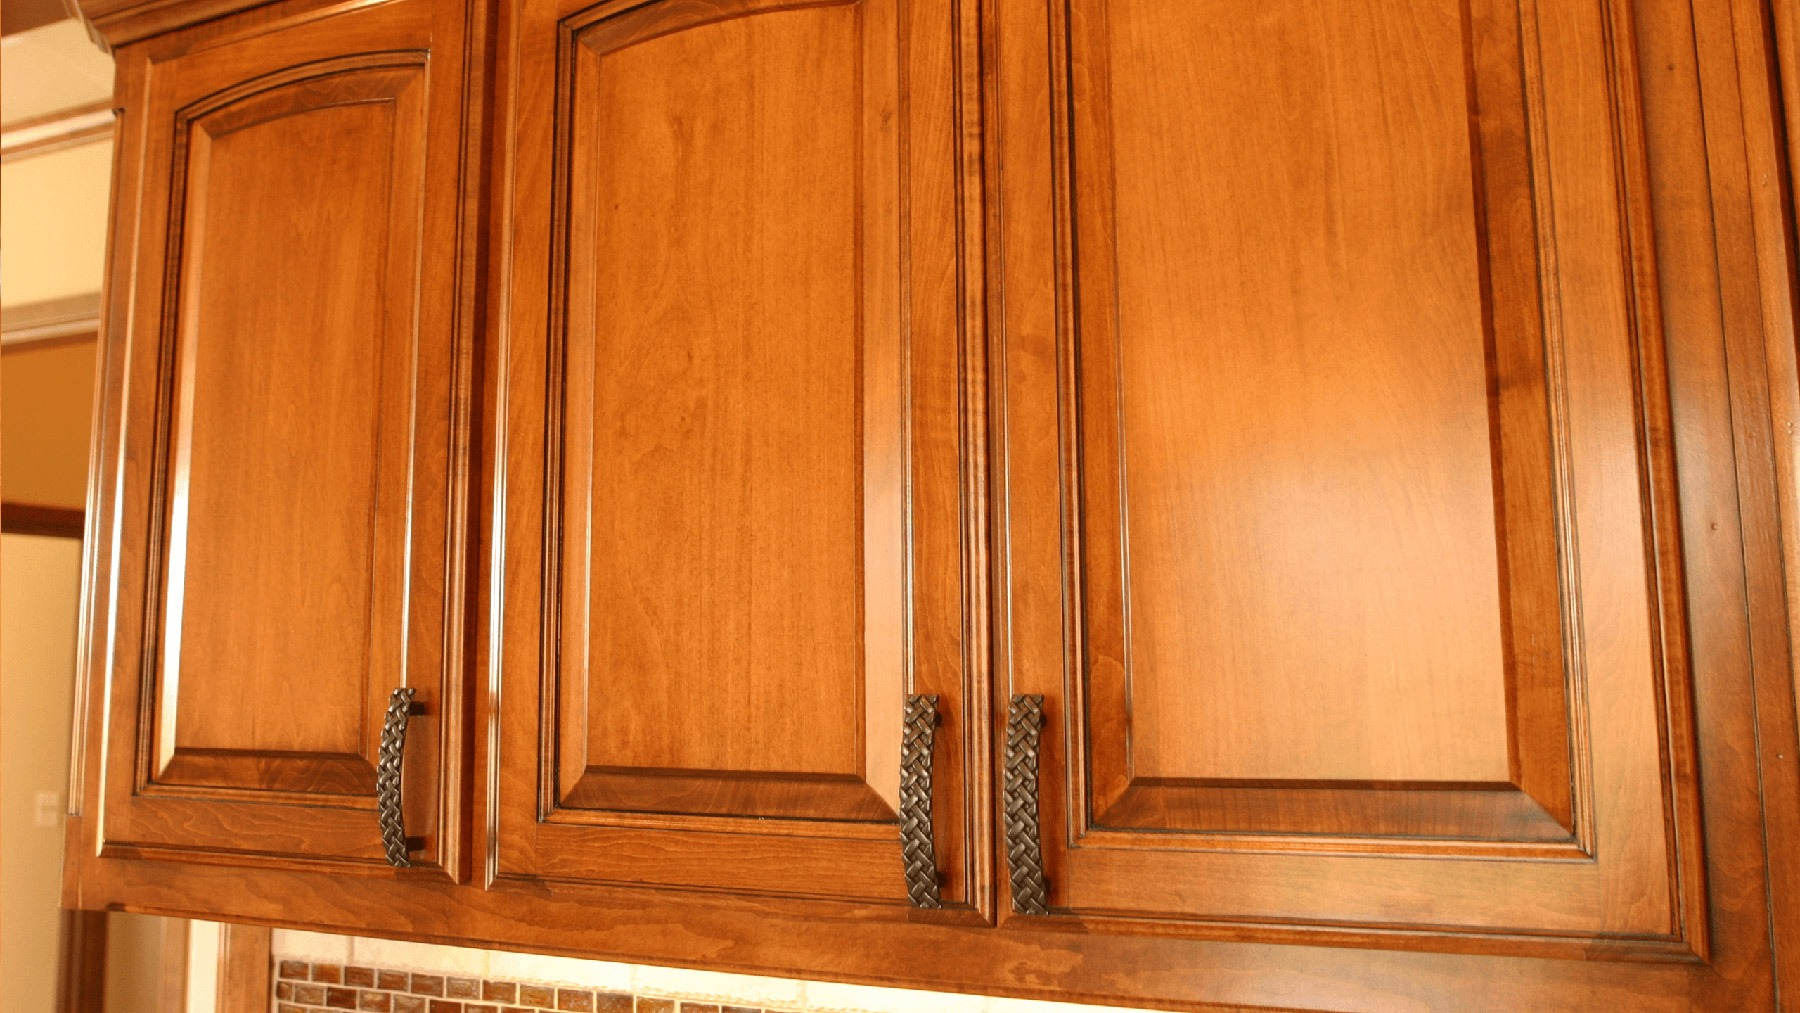 Strange Custom Cabinets Vdb Contractors Download Free Architecture Designs Intelgarnamadebymaigaardcom